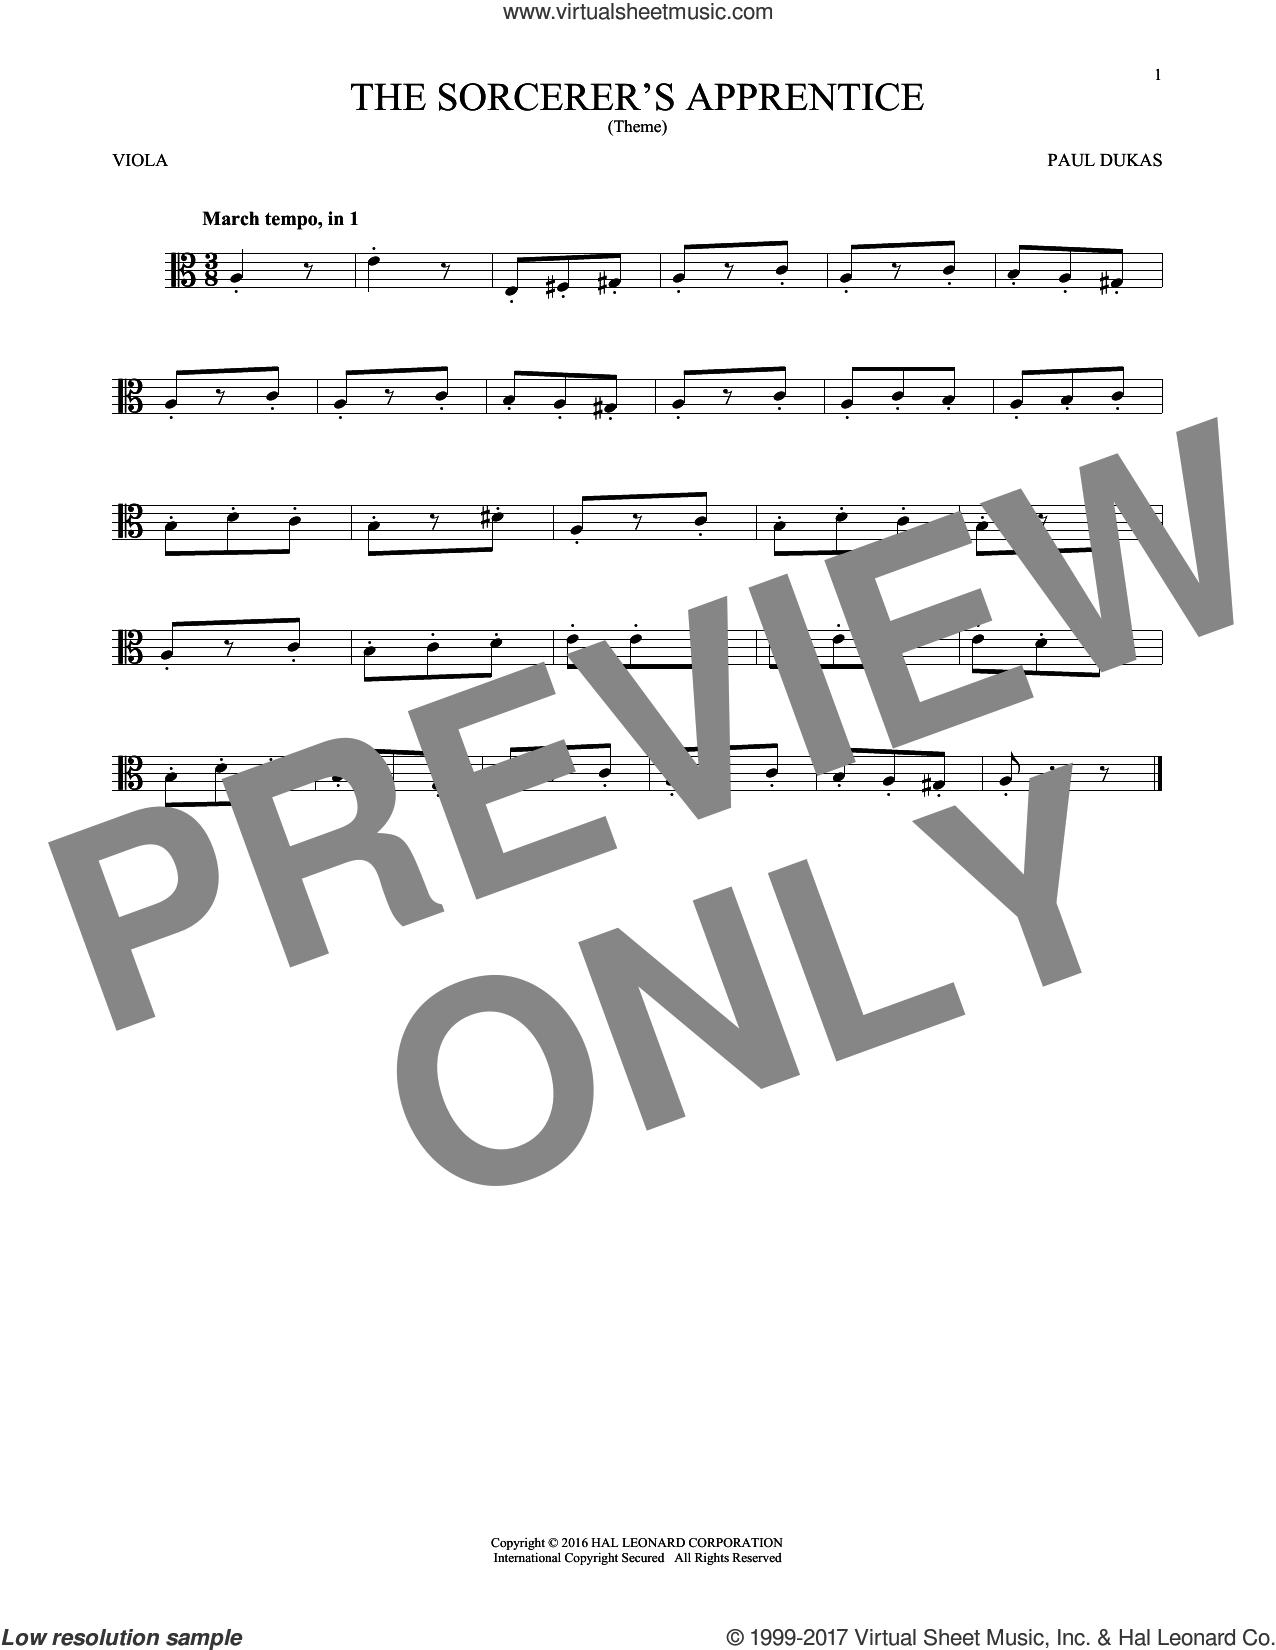 The Sorcerer's Apprentice sheet music for viola solo by Paul Dukas, classical score, intermediate skill level